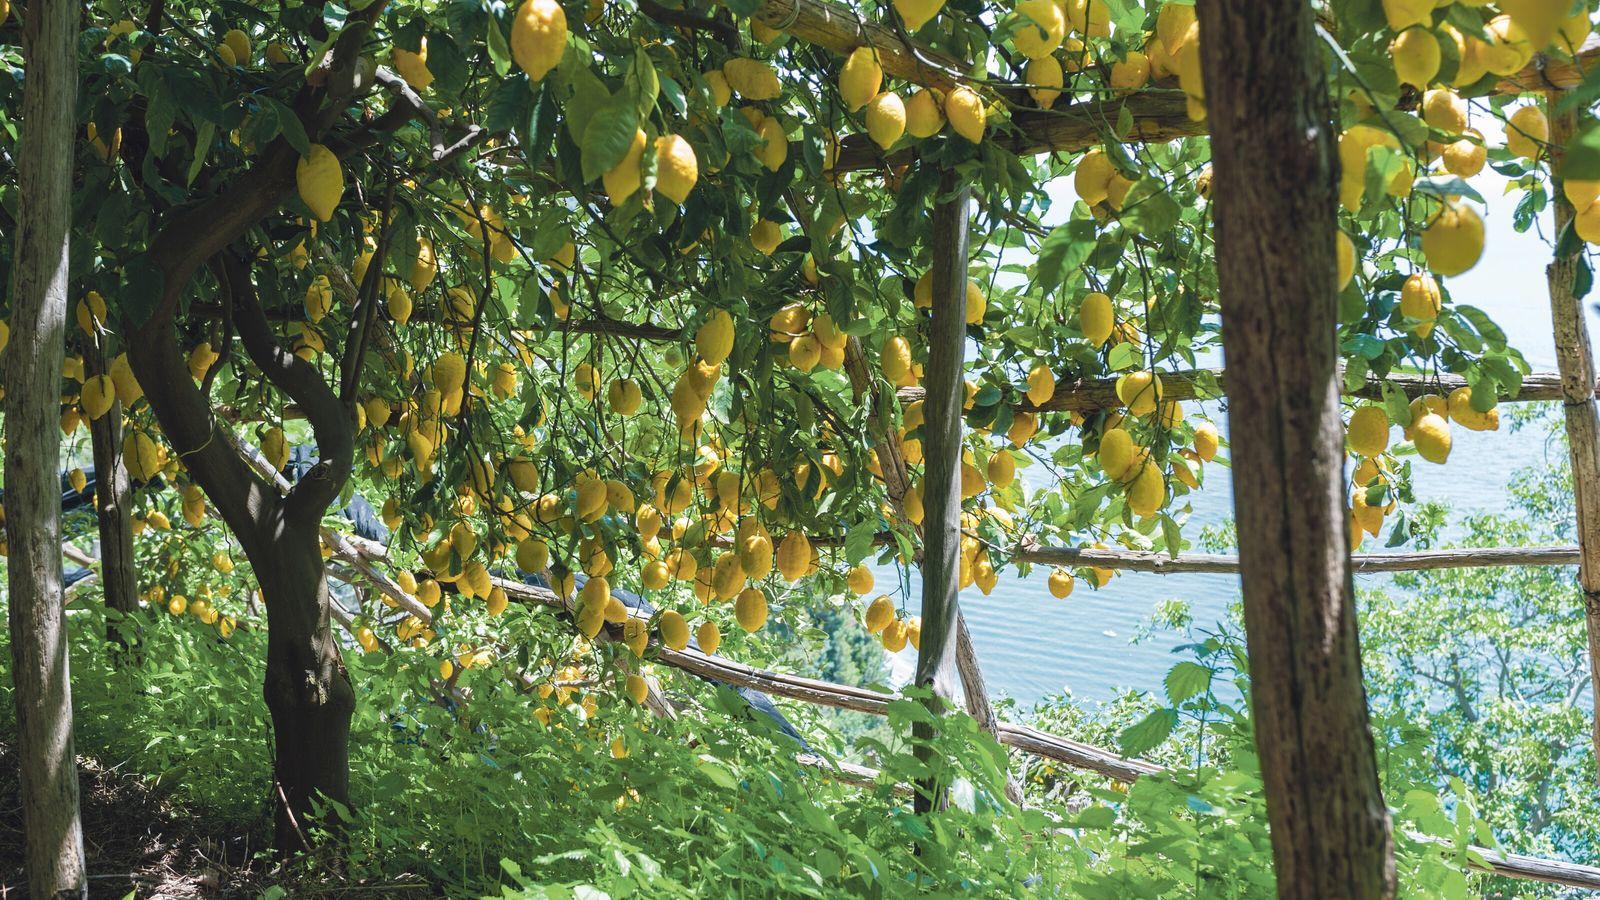 Sfusato amalfitano lemon variety.